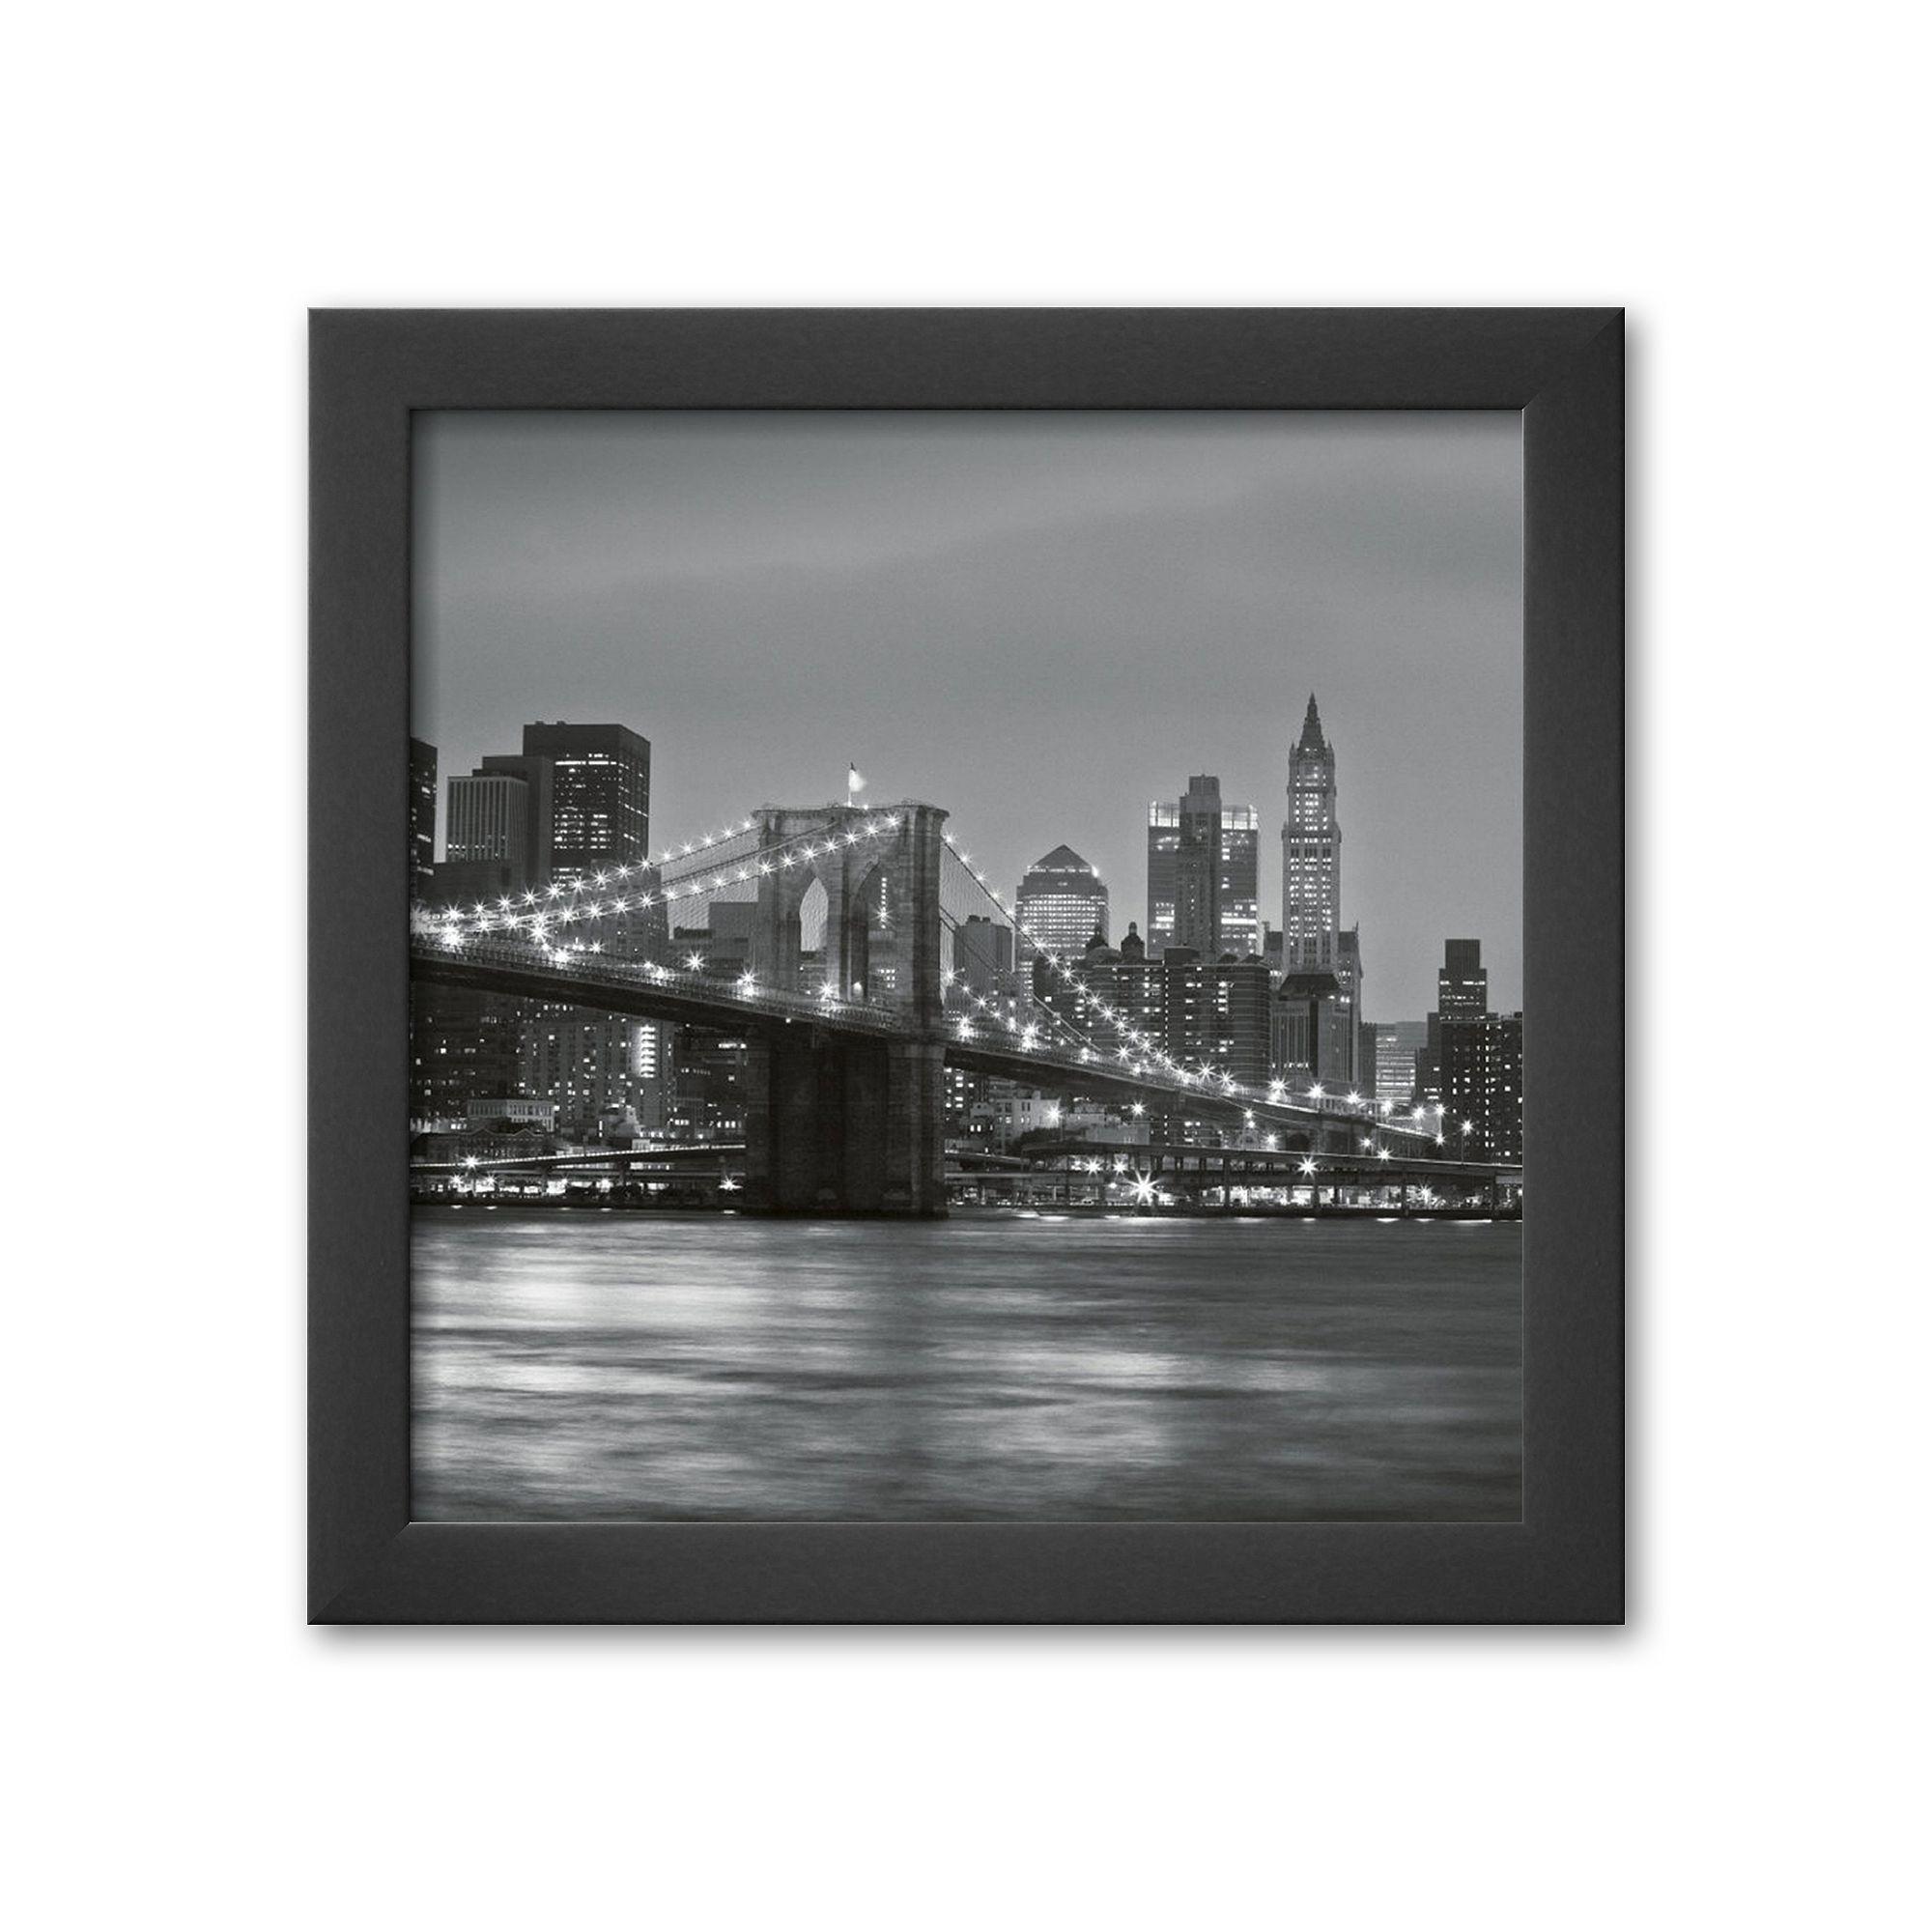 Artcom Brooklyn Bridge Framed Art Print By Torsten Hoffmann, Multicolor